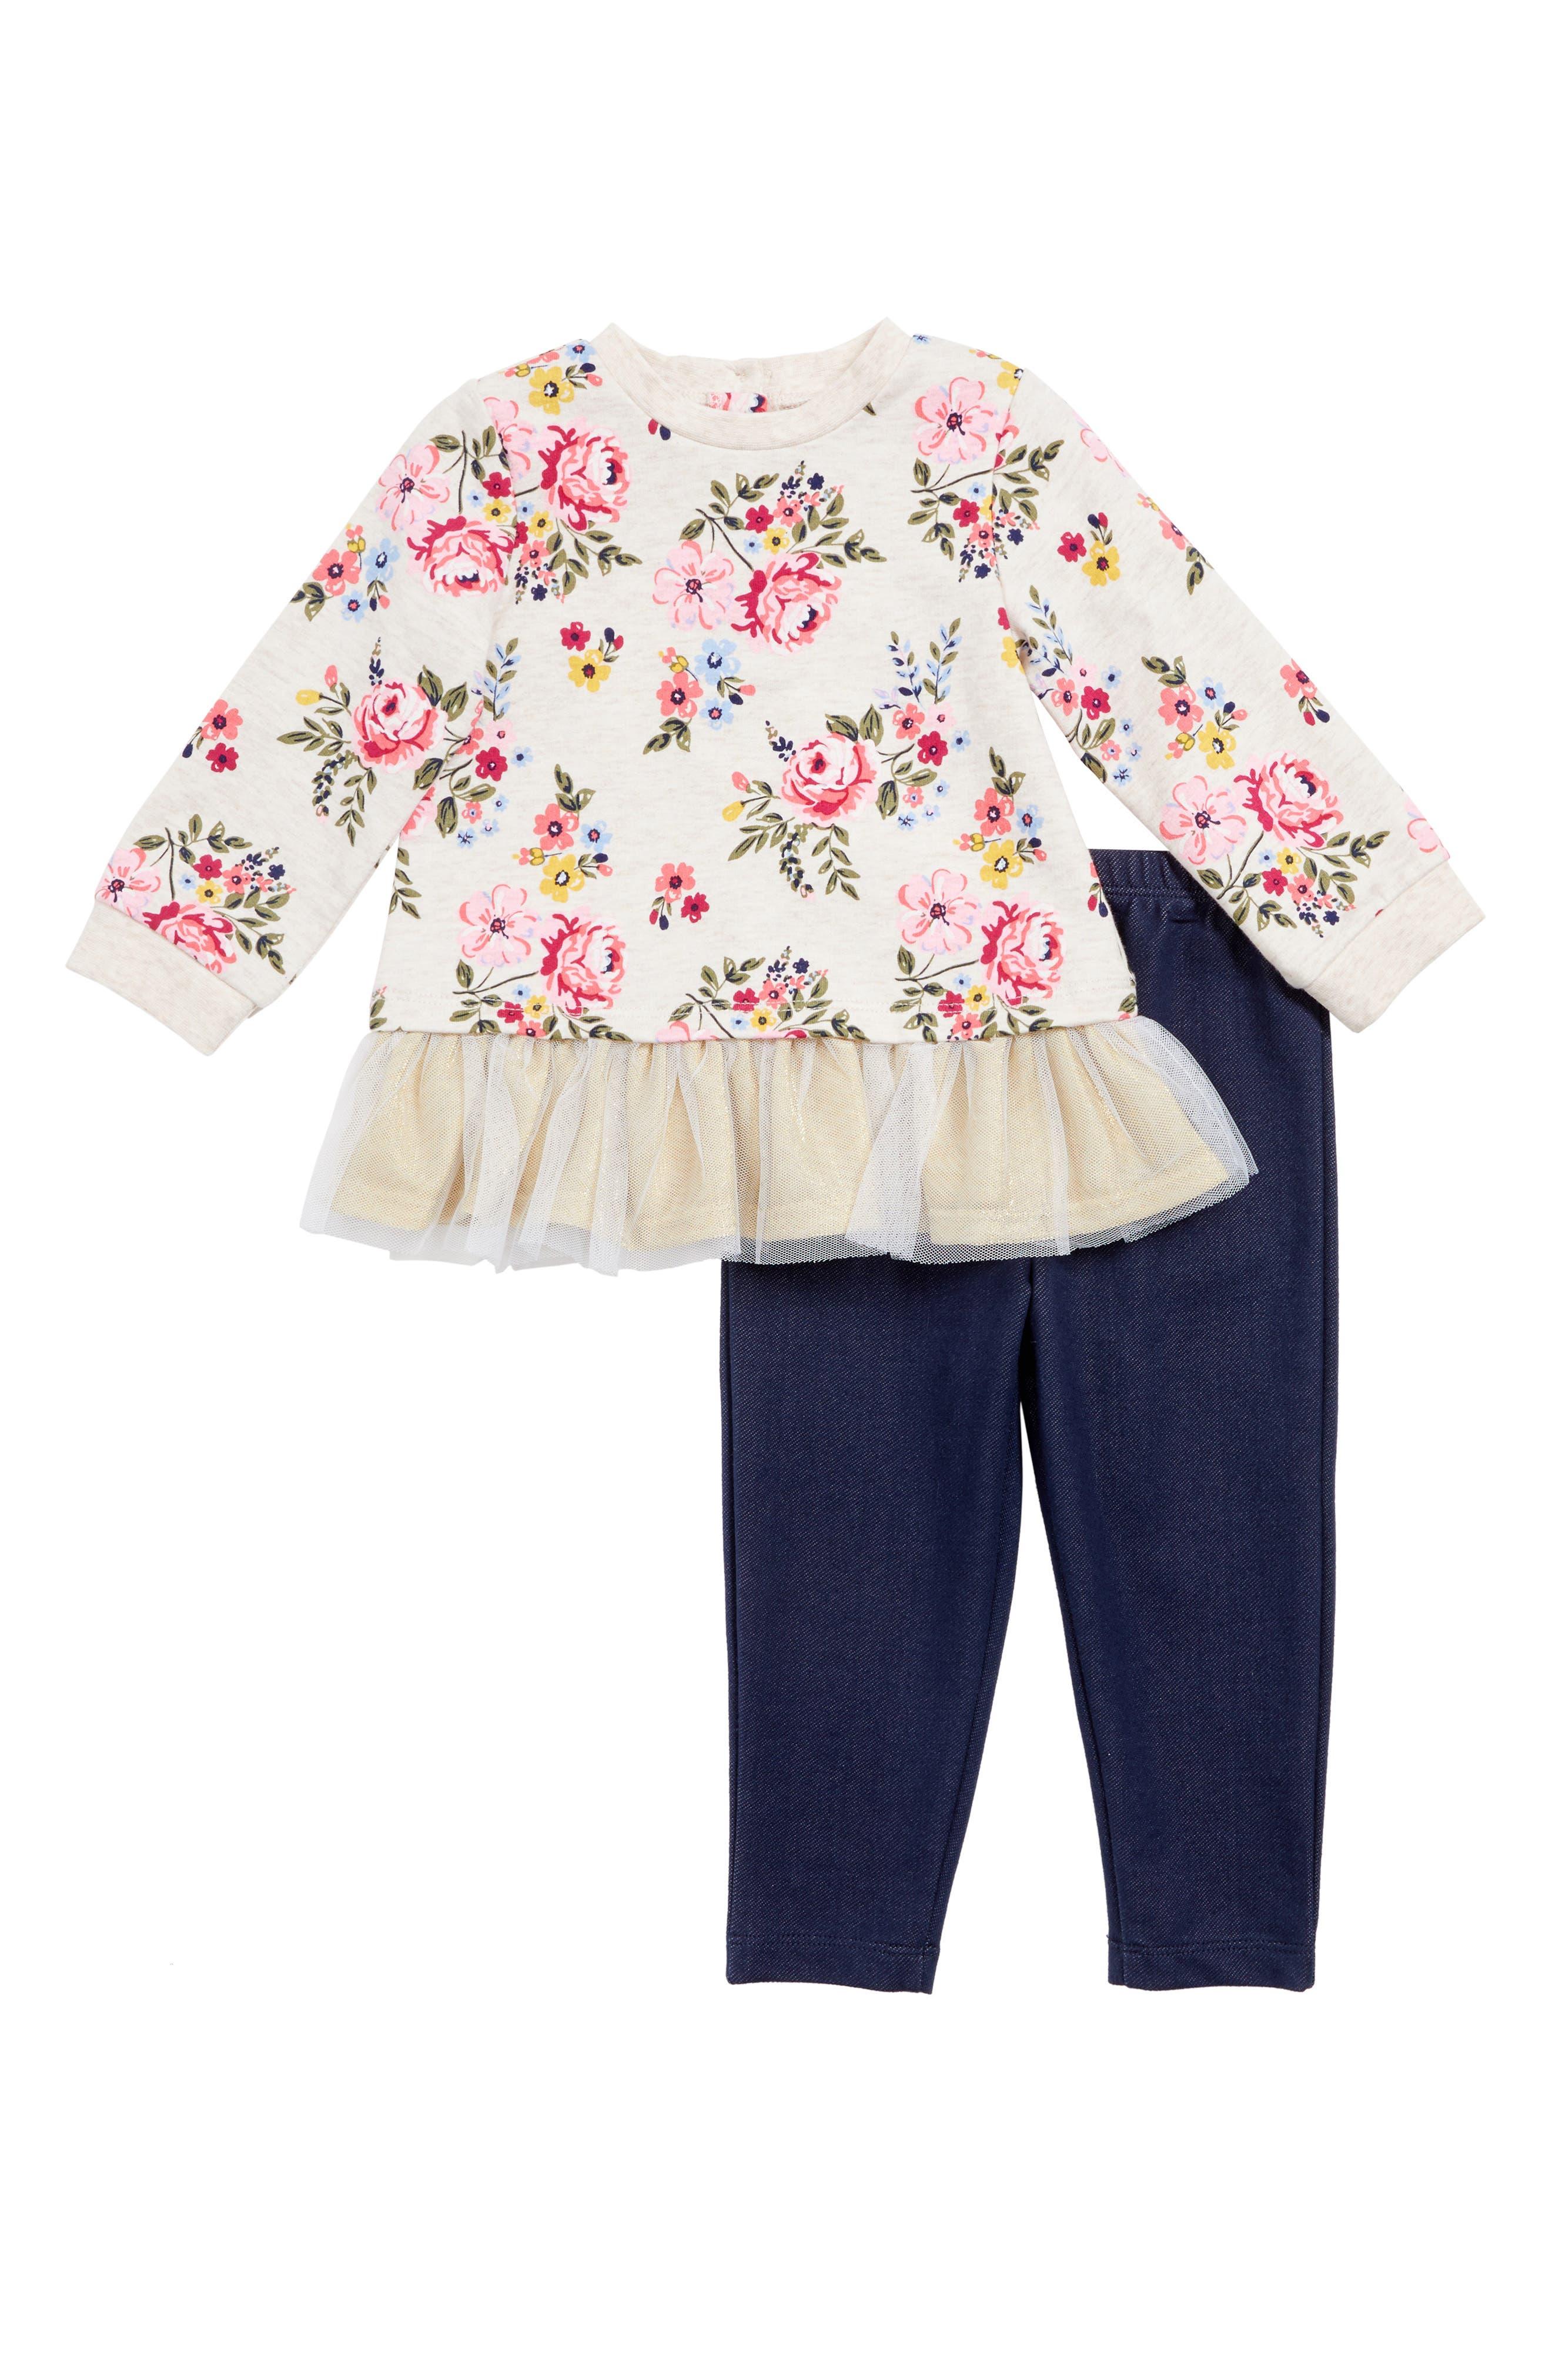 Alternate Image 1 Selected - Little Me Floral Top & Leggings Set (Baby Girls)